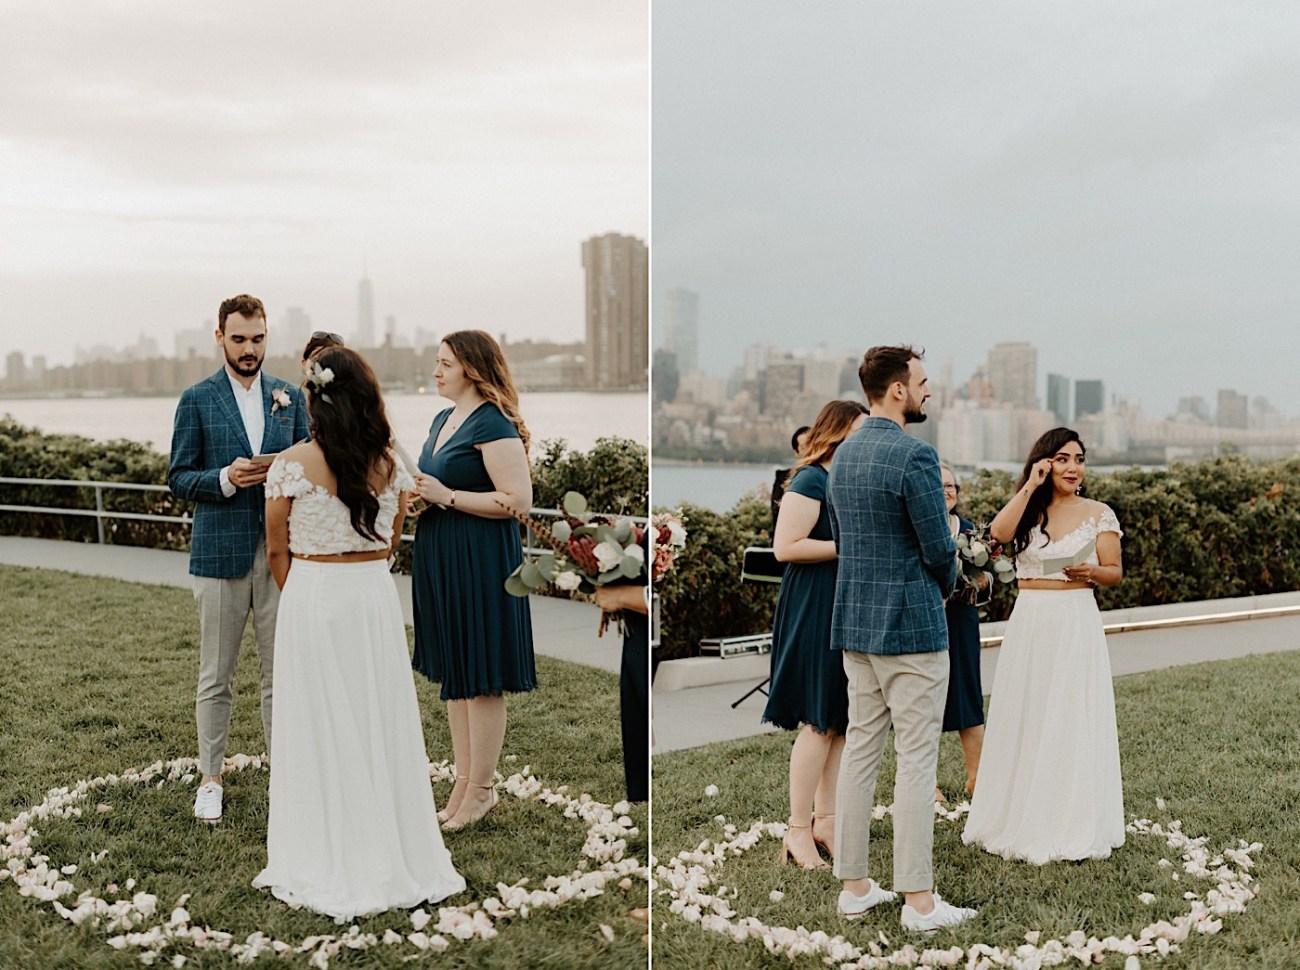 LIC Wedding Greenpoint Wedding LIC Elopement New York Wedding Photographer 051